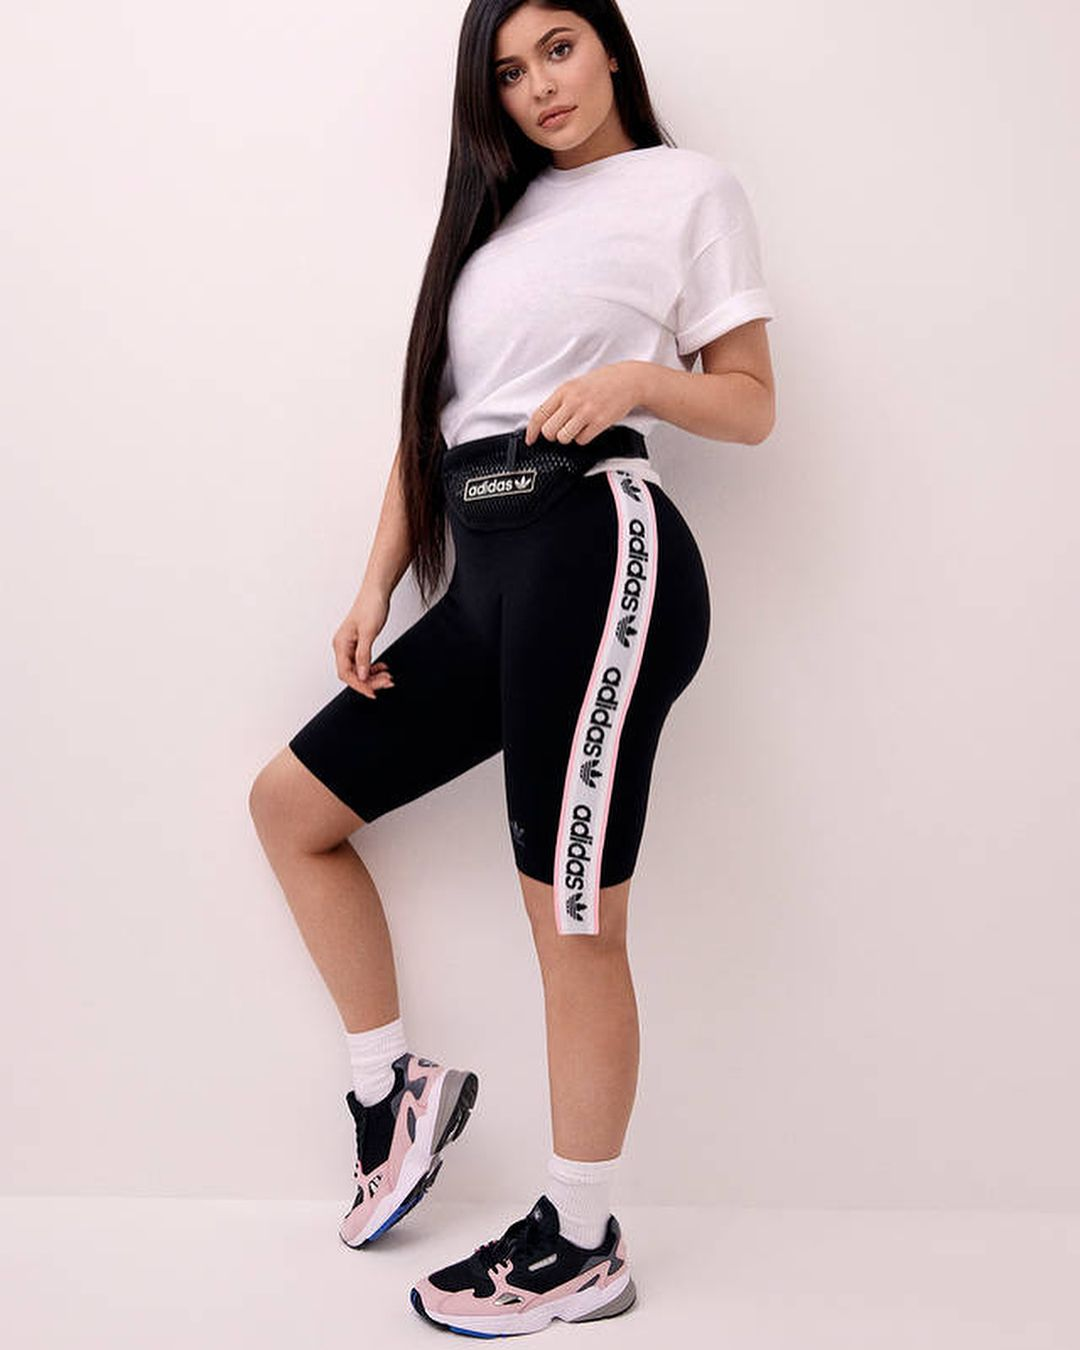 pantaloni adidas kendall jenner